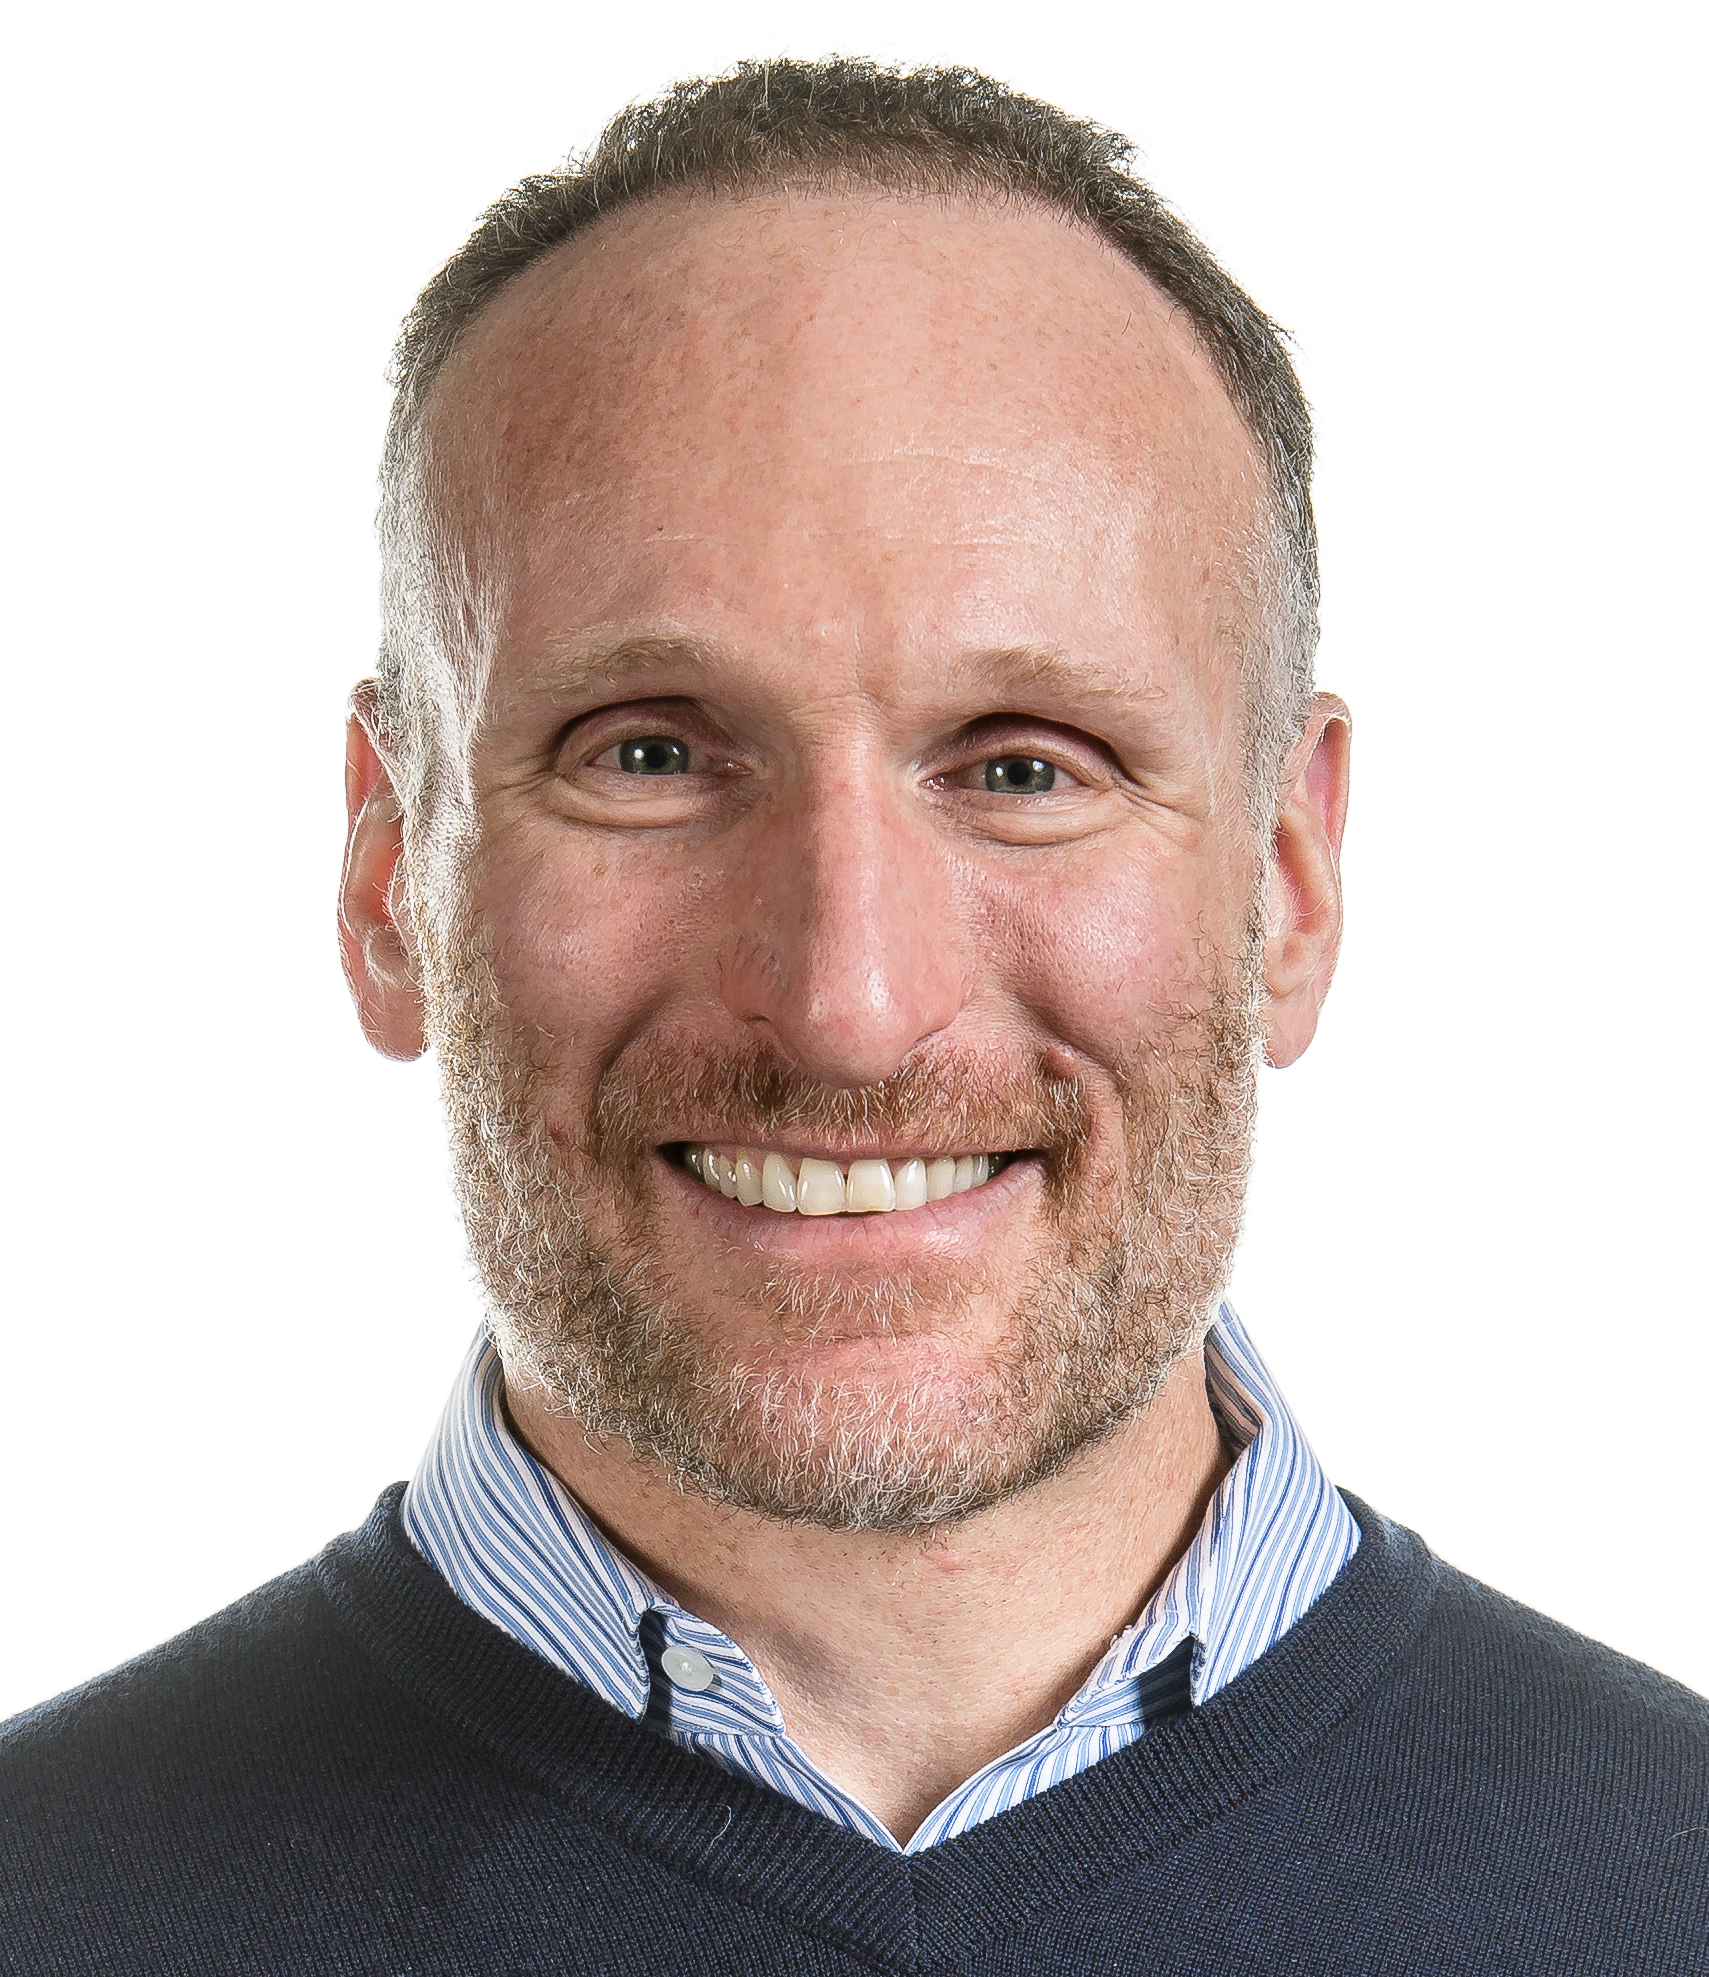 Caption: Mark Shapiro, Toronto Bluejays President & CEO